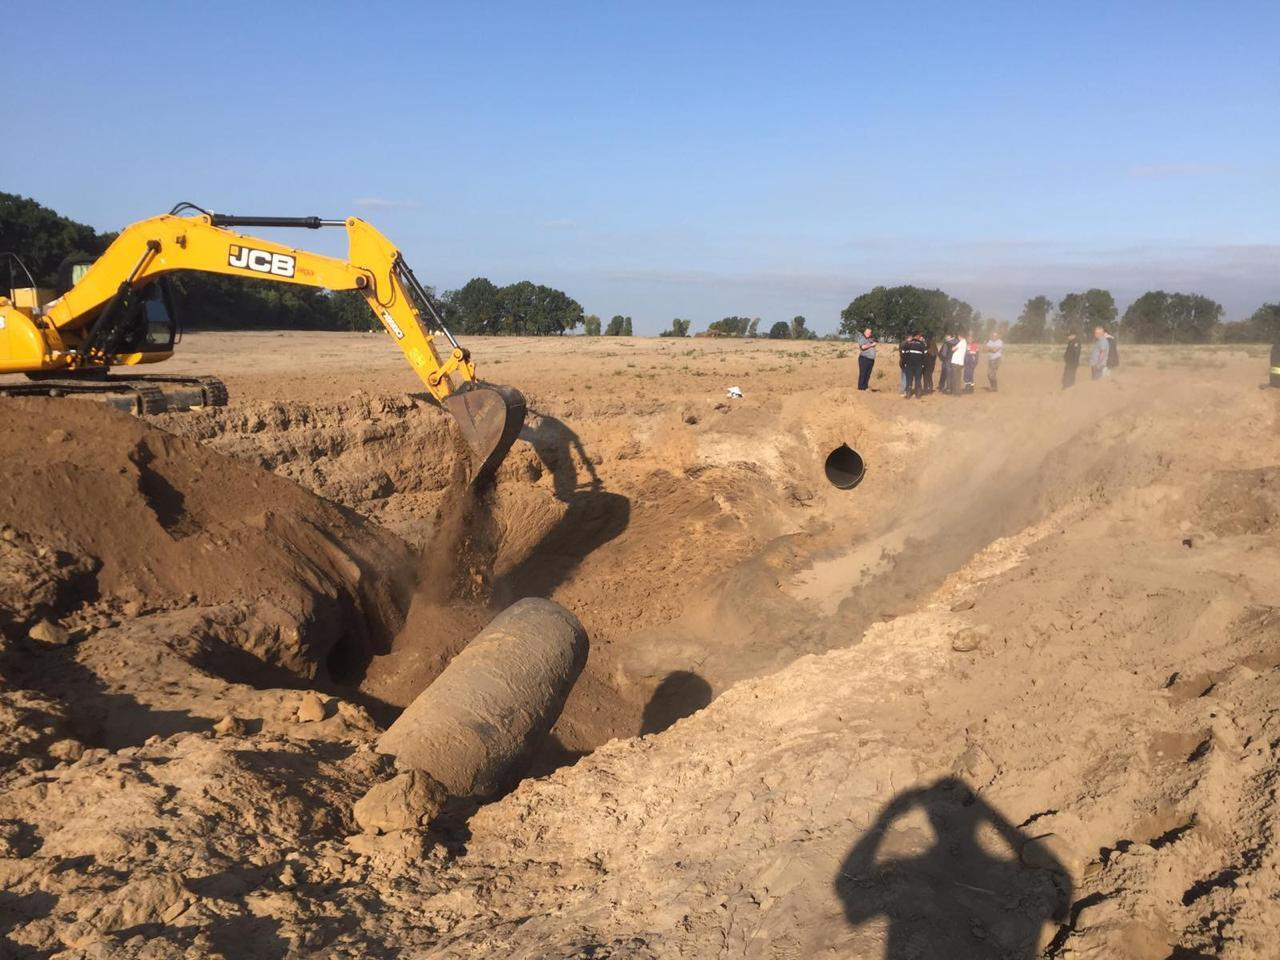 Последствия взрыва на газопроводе в районе Чабанов.